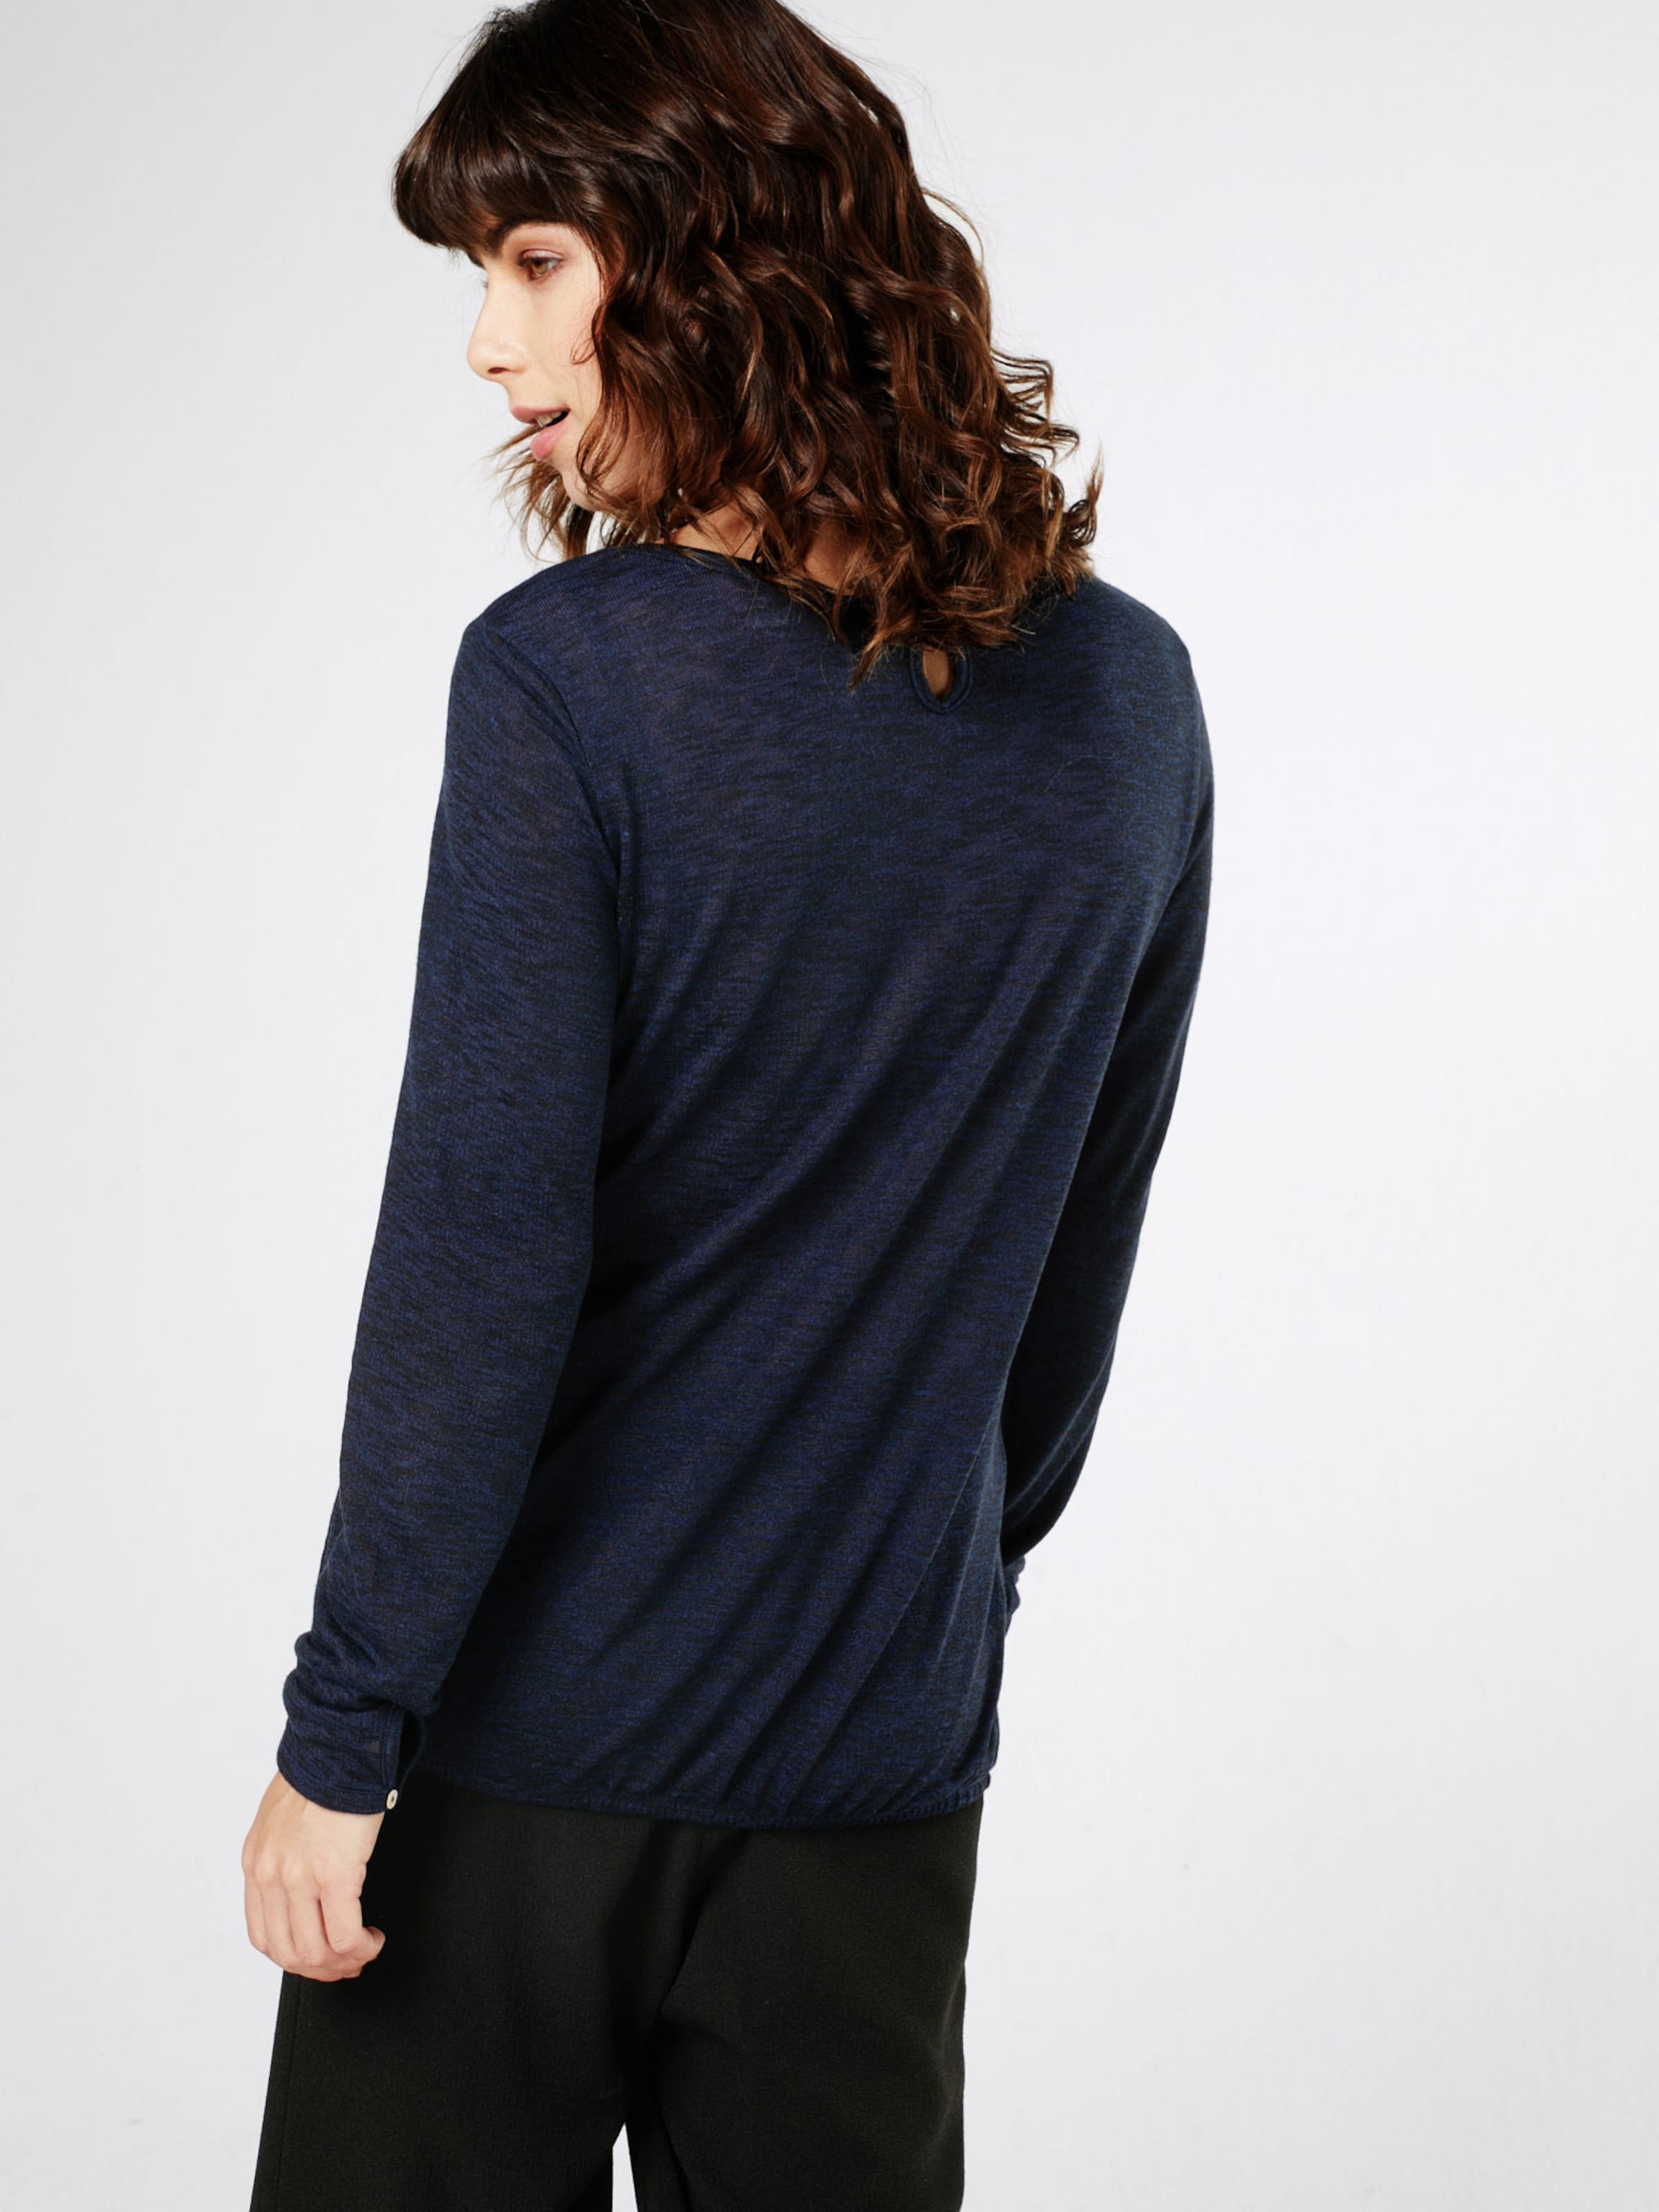 Manchester Verkauf Online ESPRIT Jersey Shirt 'Bubblehem' Neueste Online Billig Offiziellen WZ1wnXnQOw